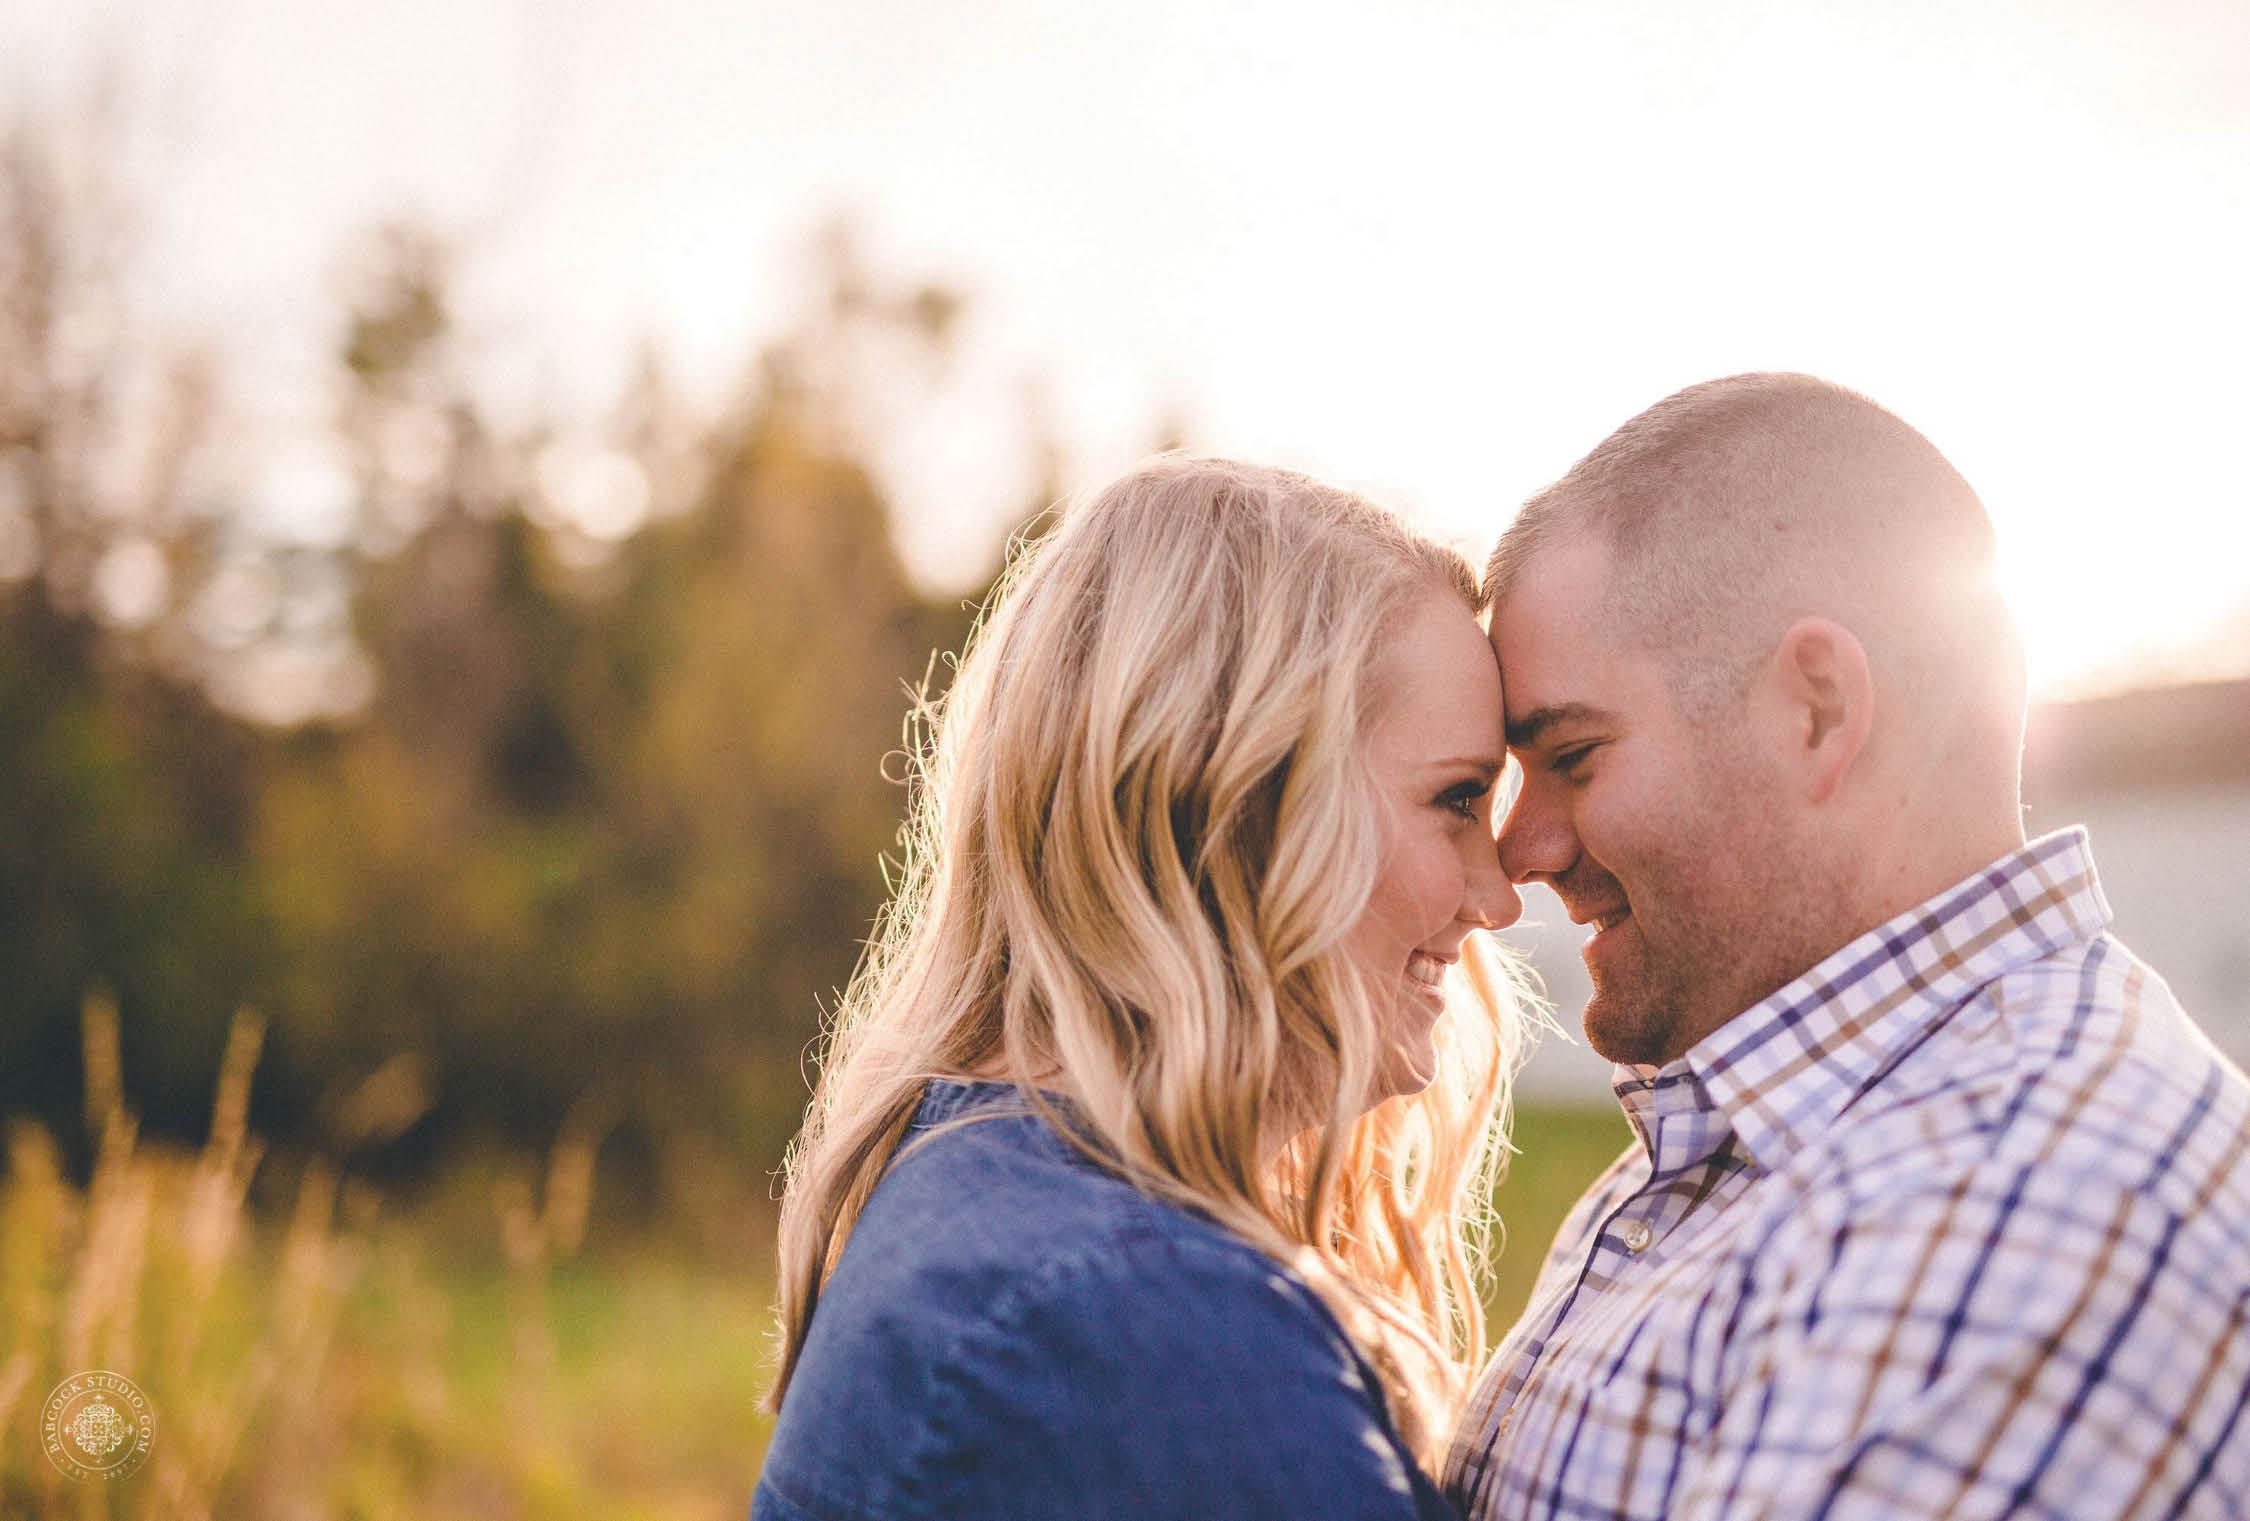 sarah-justin-engagement-photographer-dayton-ohio-4.jpg